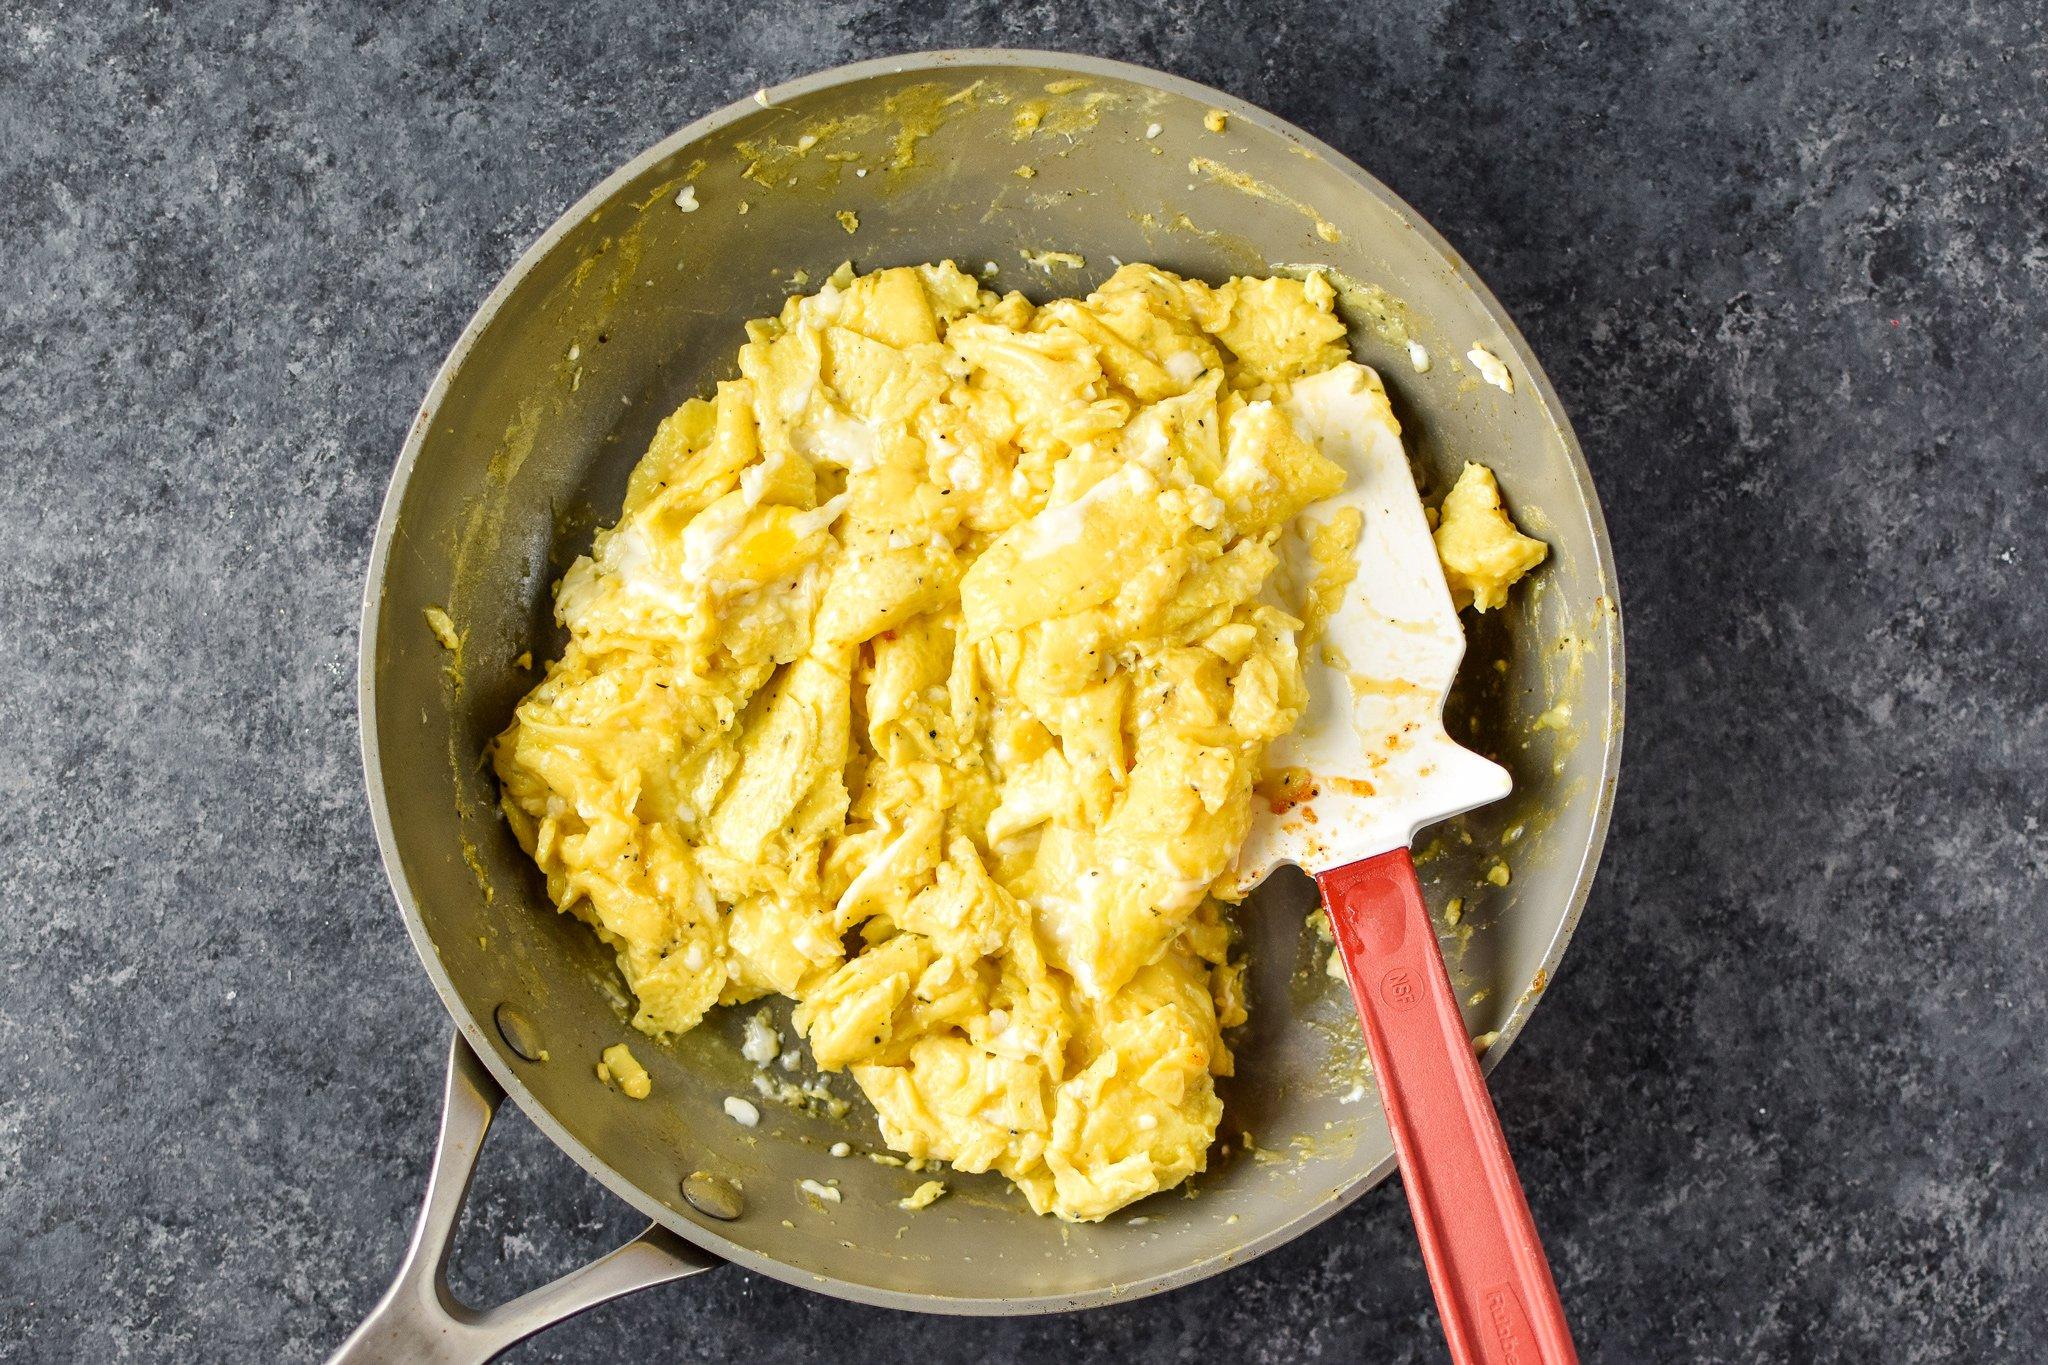 A pan of fresh scrambled eggs, top view.